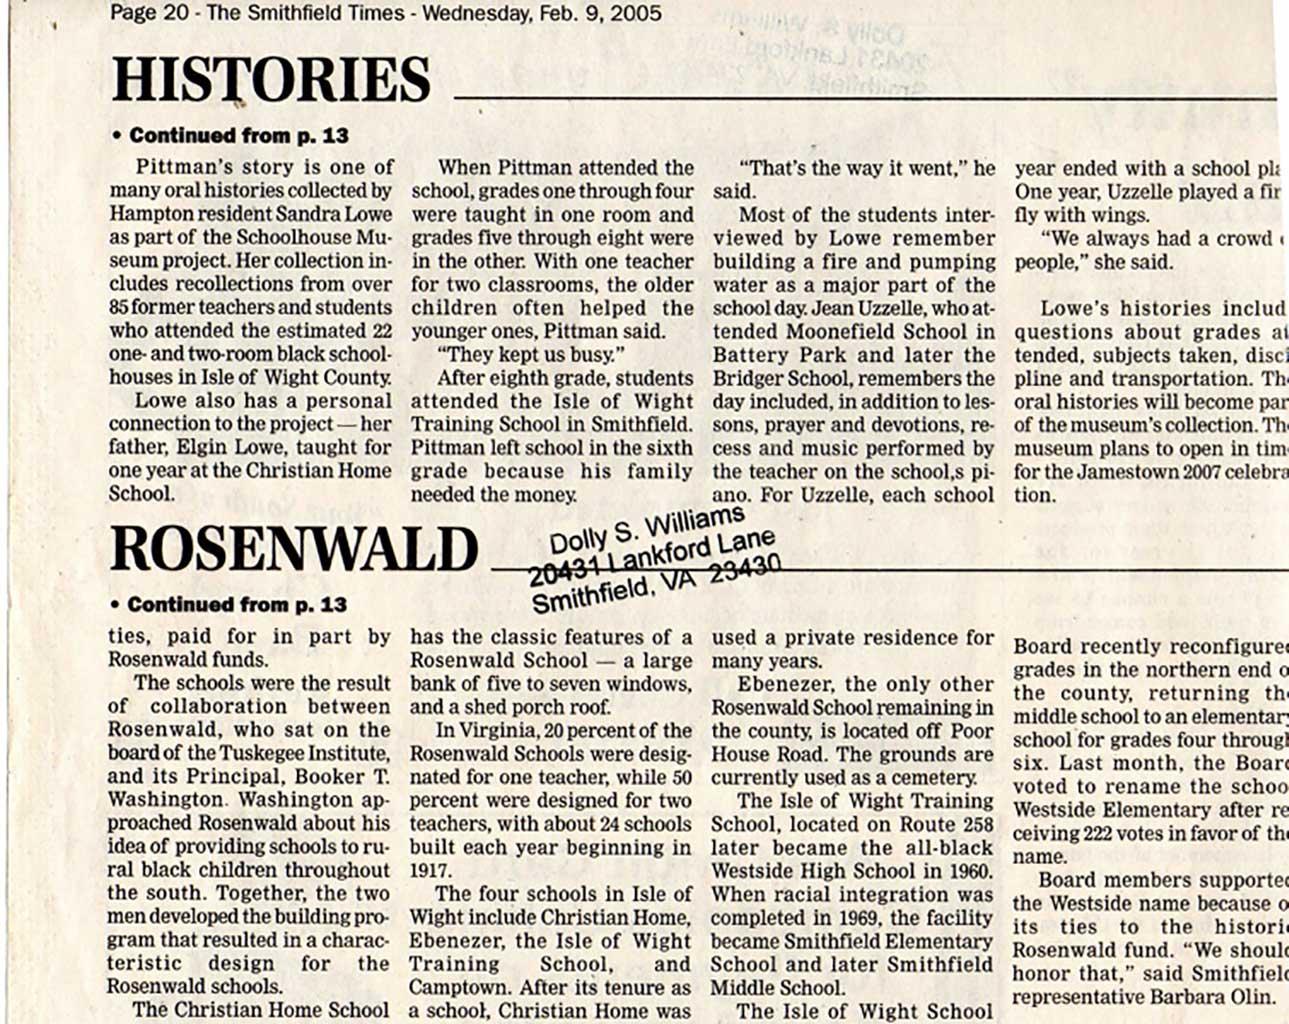 rosewald-school-part-8-img271